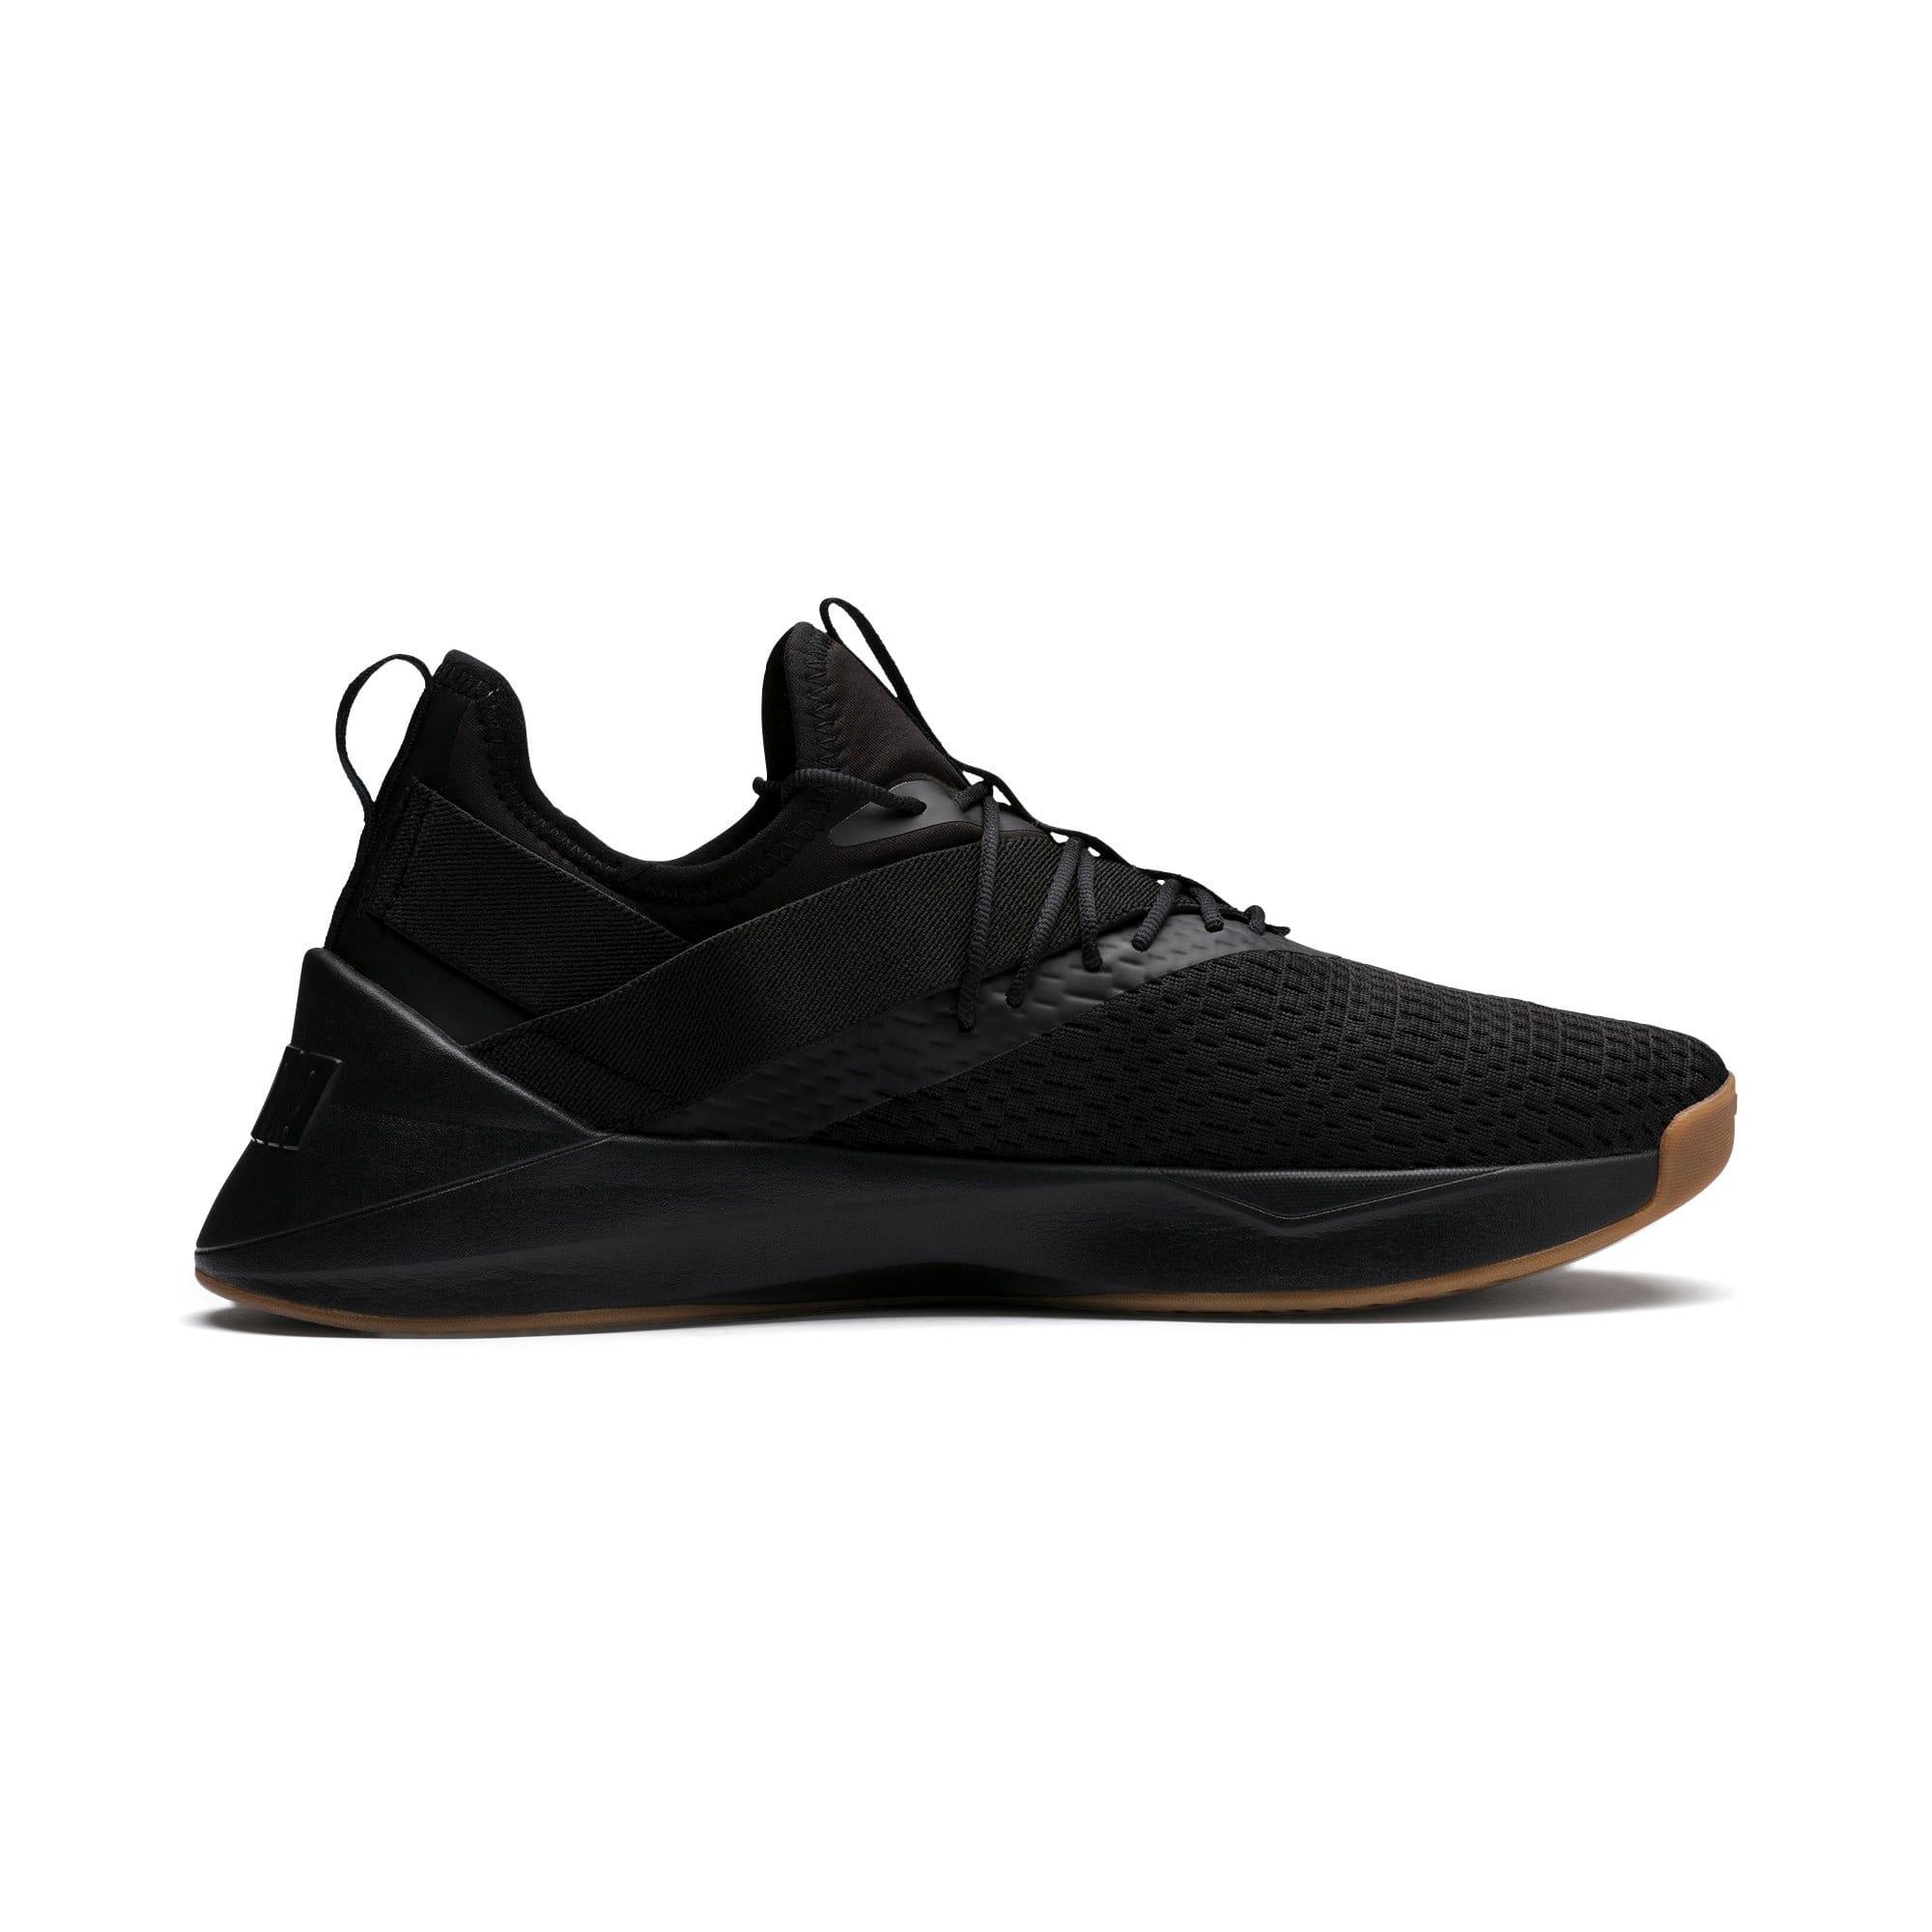 Thumbnail 5 of Jaab XT Summer Men's Training Shoes, Puma Black-Asphalt, medium